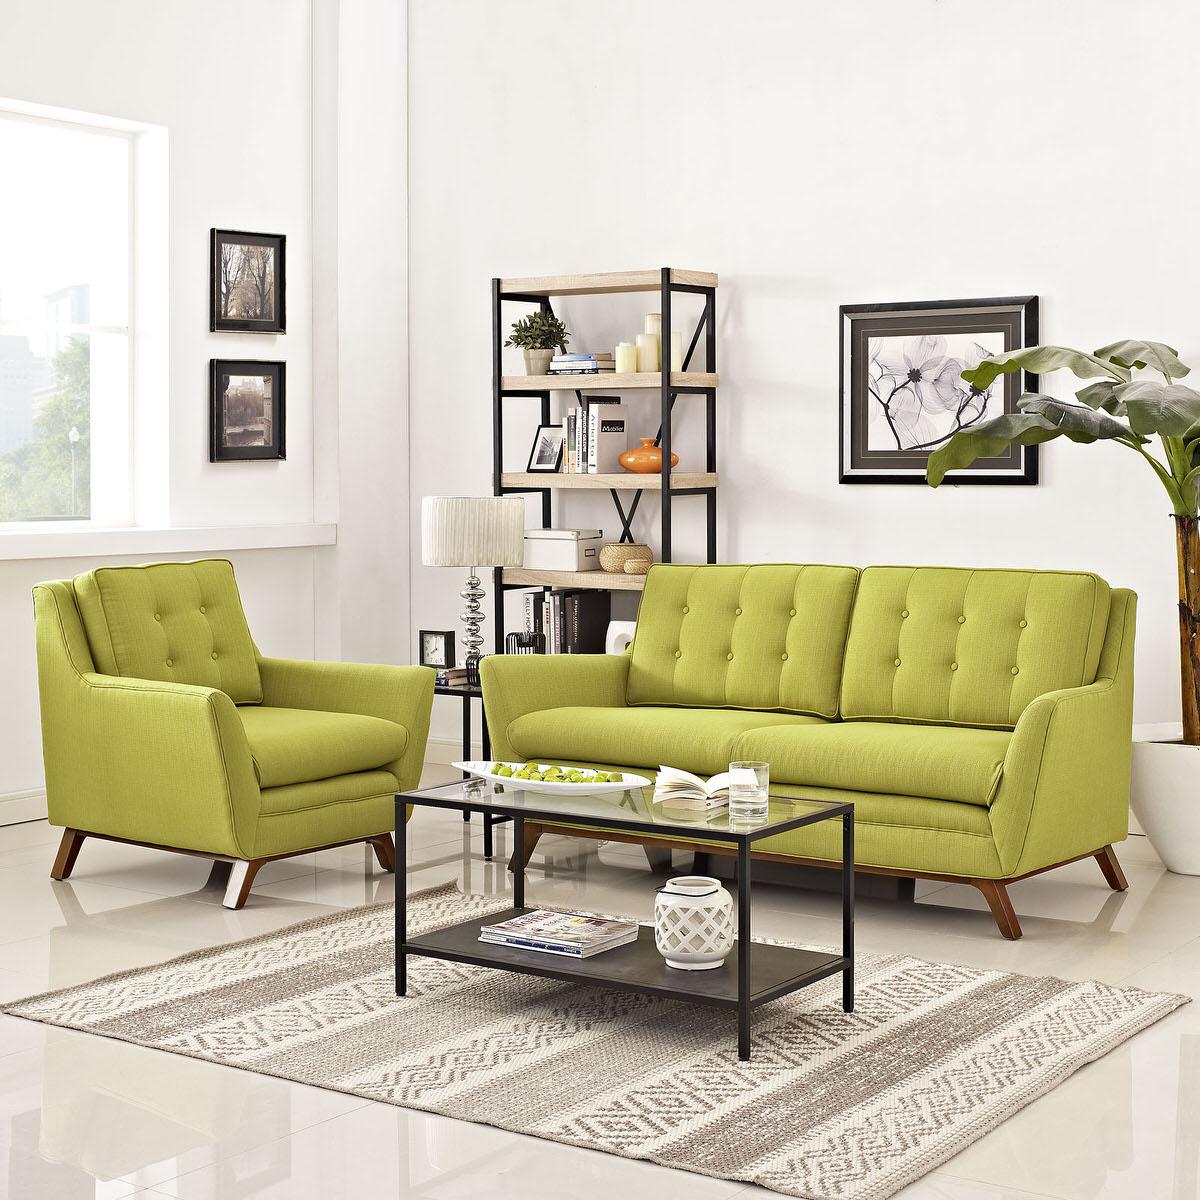 Beguile Living Room Set Upholstered Fabric